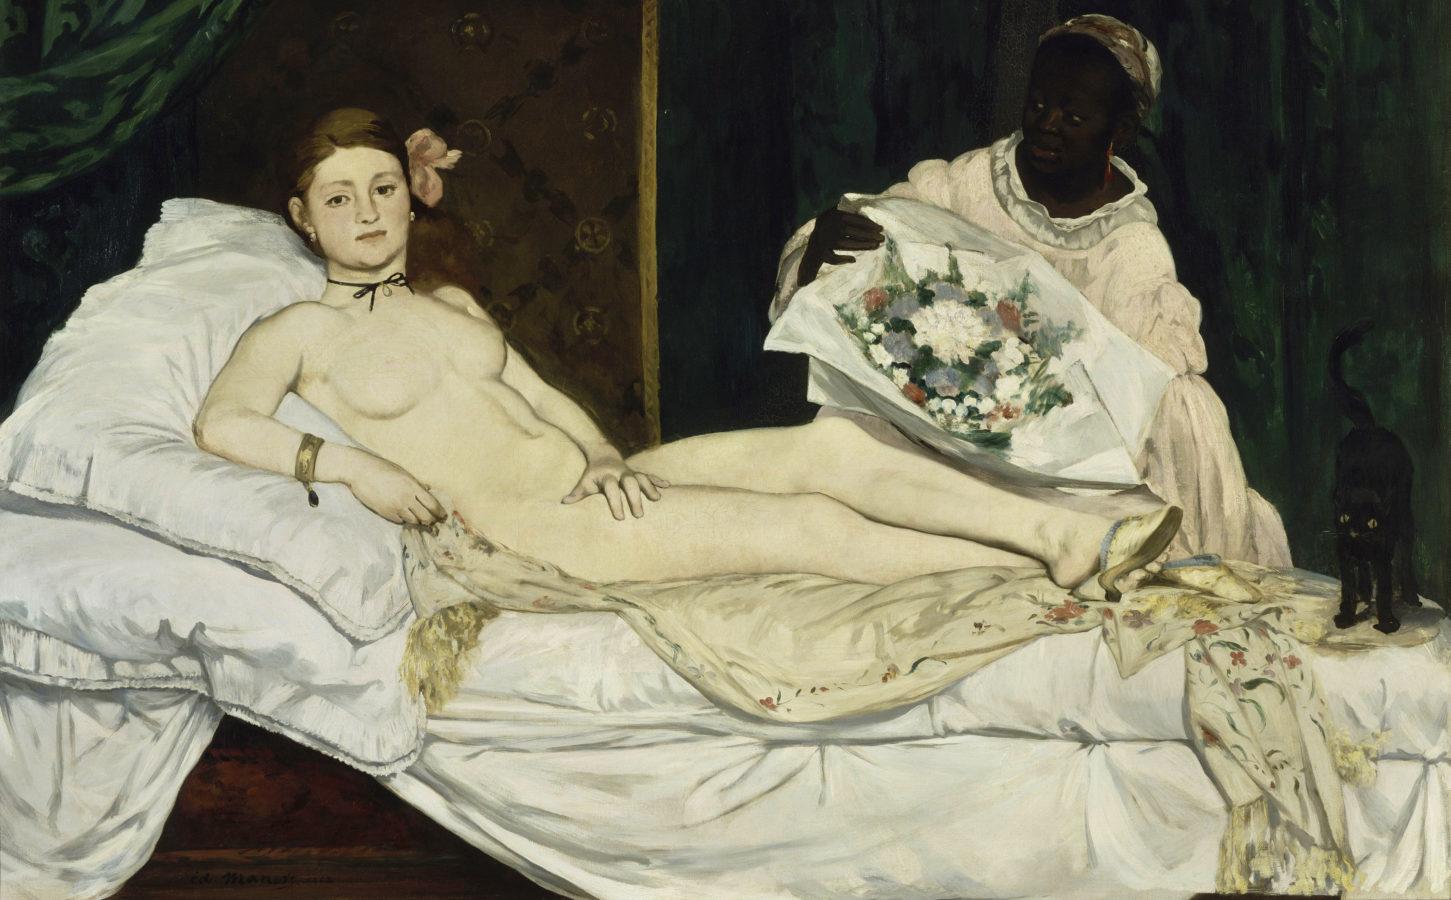 Art in BoJack Horseman Edouard Manet, Olympia, 1856, Musee d'Orsay, Paris